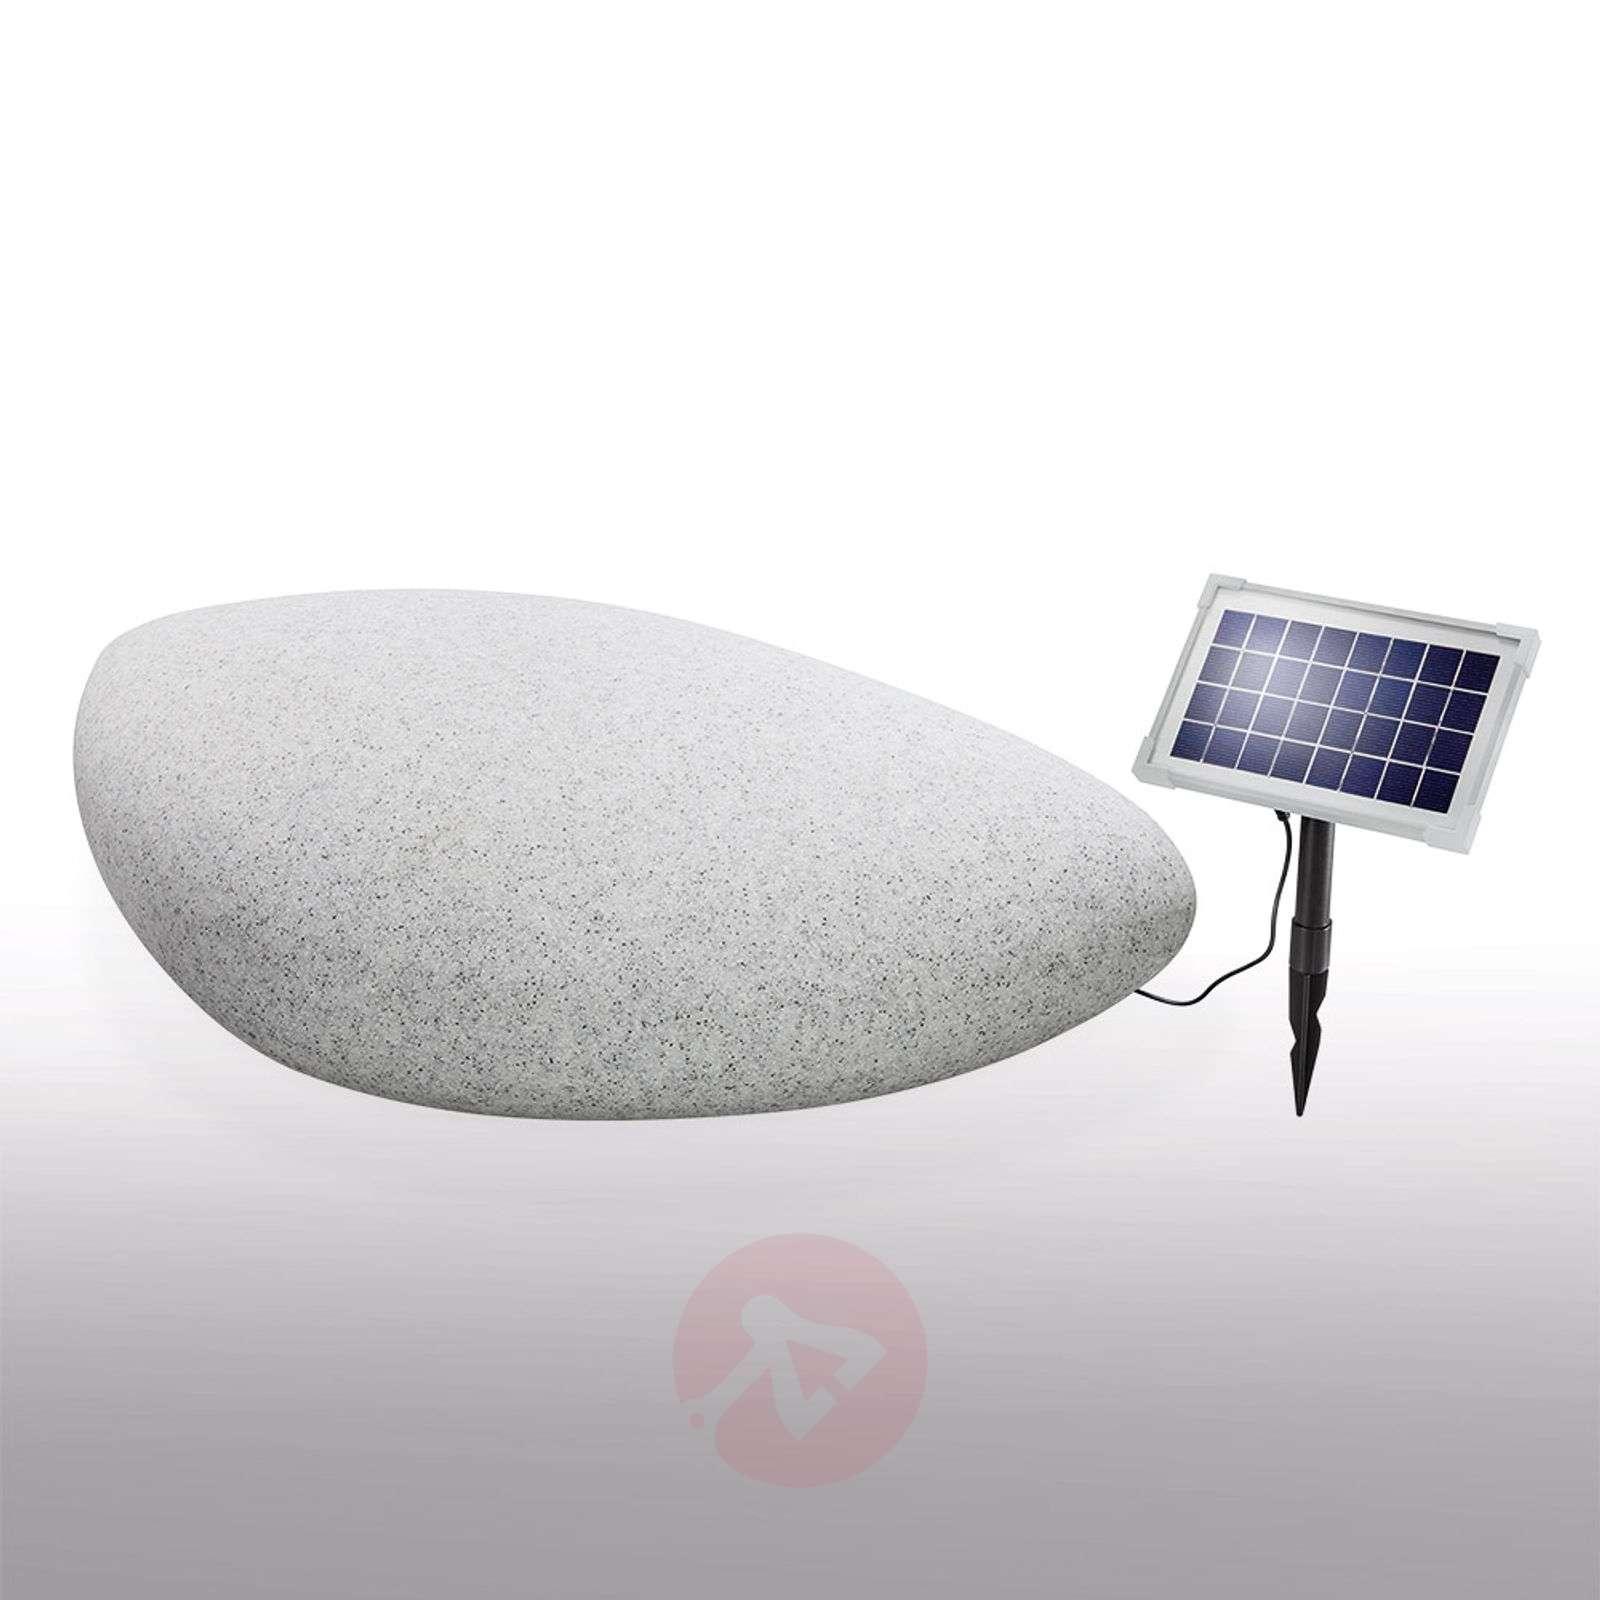 Outdoor decorative light solar LED Stone 40-3012503-02